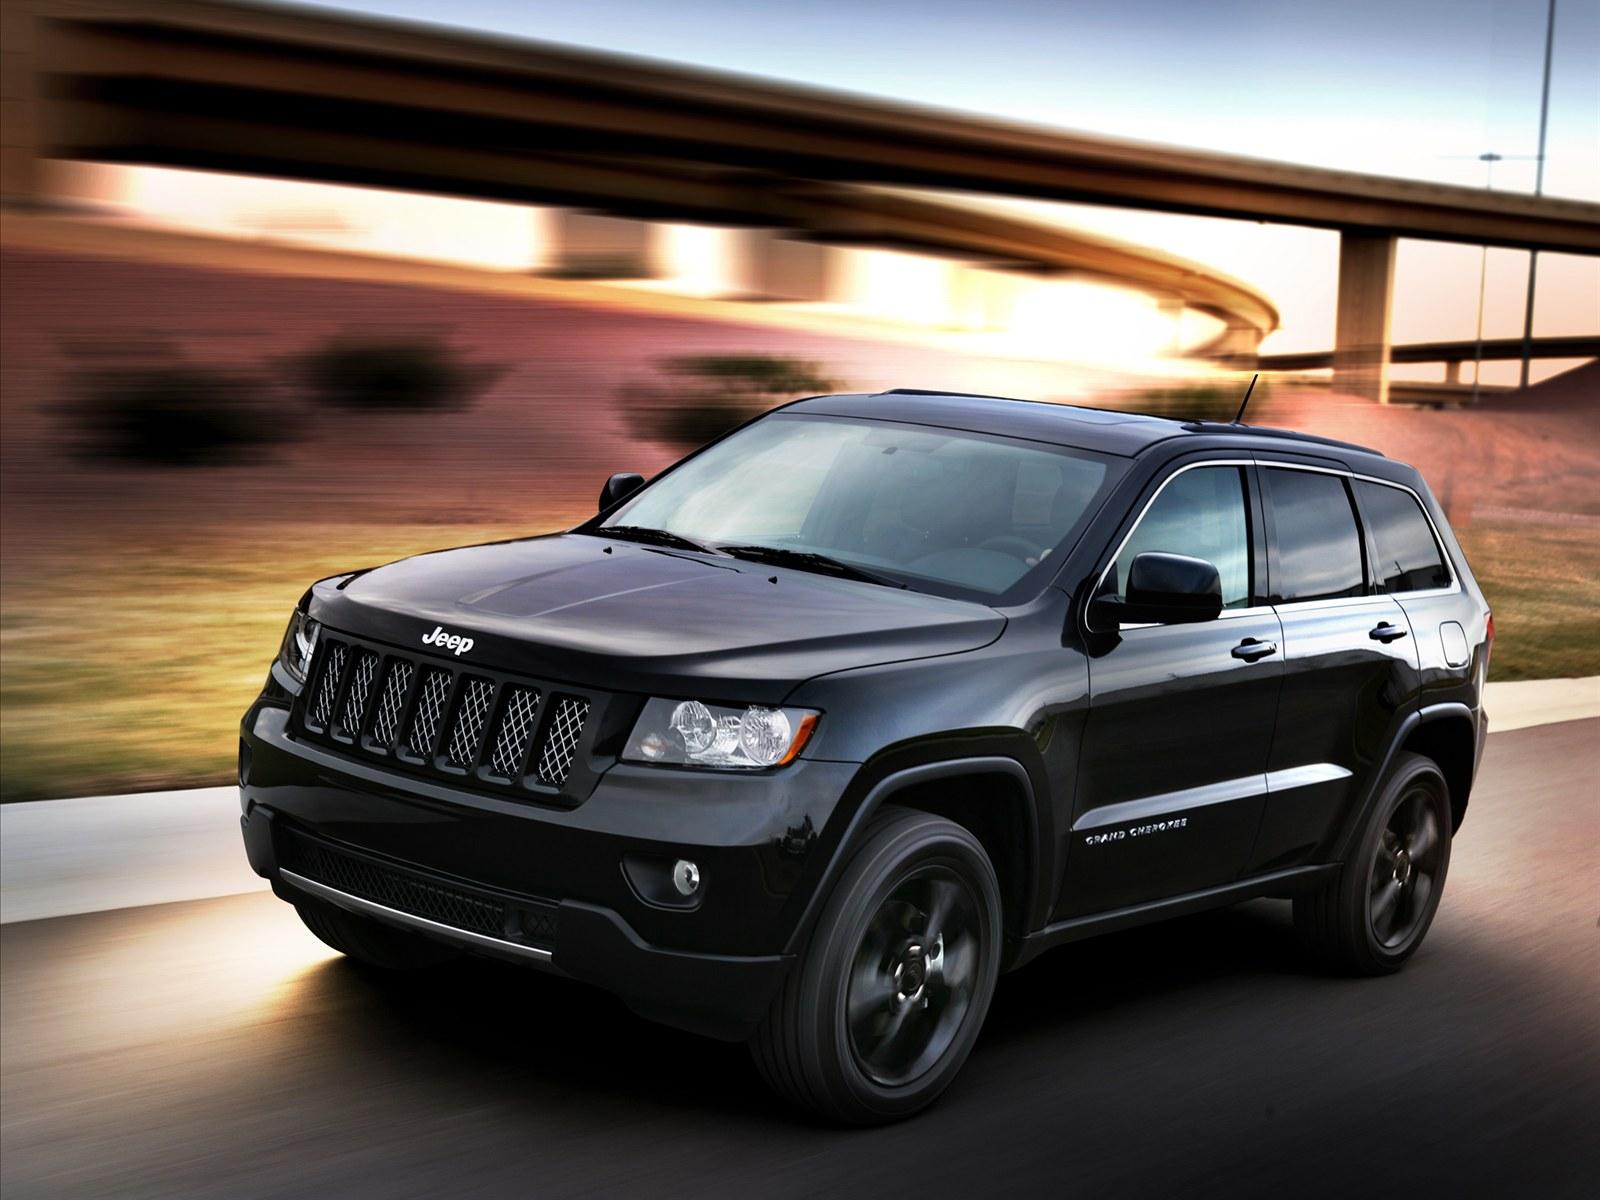 jeep jeep grand cherokee concept 2012. Black Bedroom Furniture Sets. Home Design Ideas